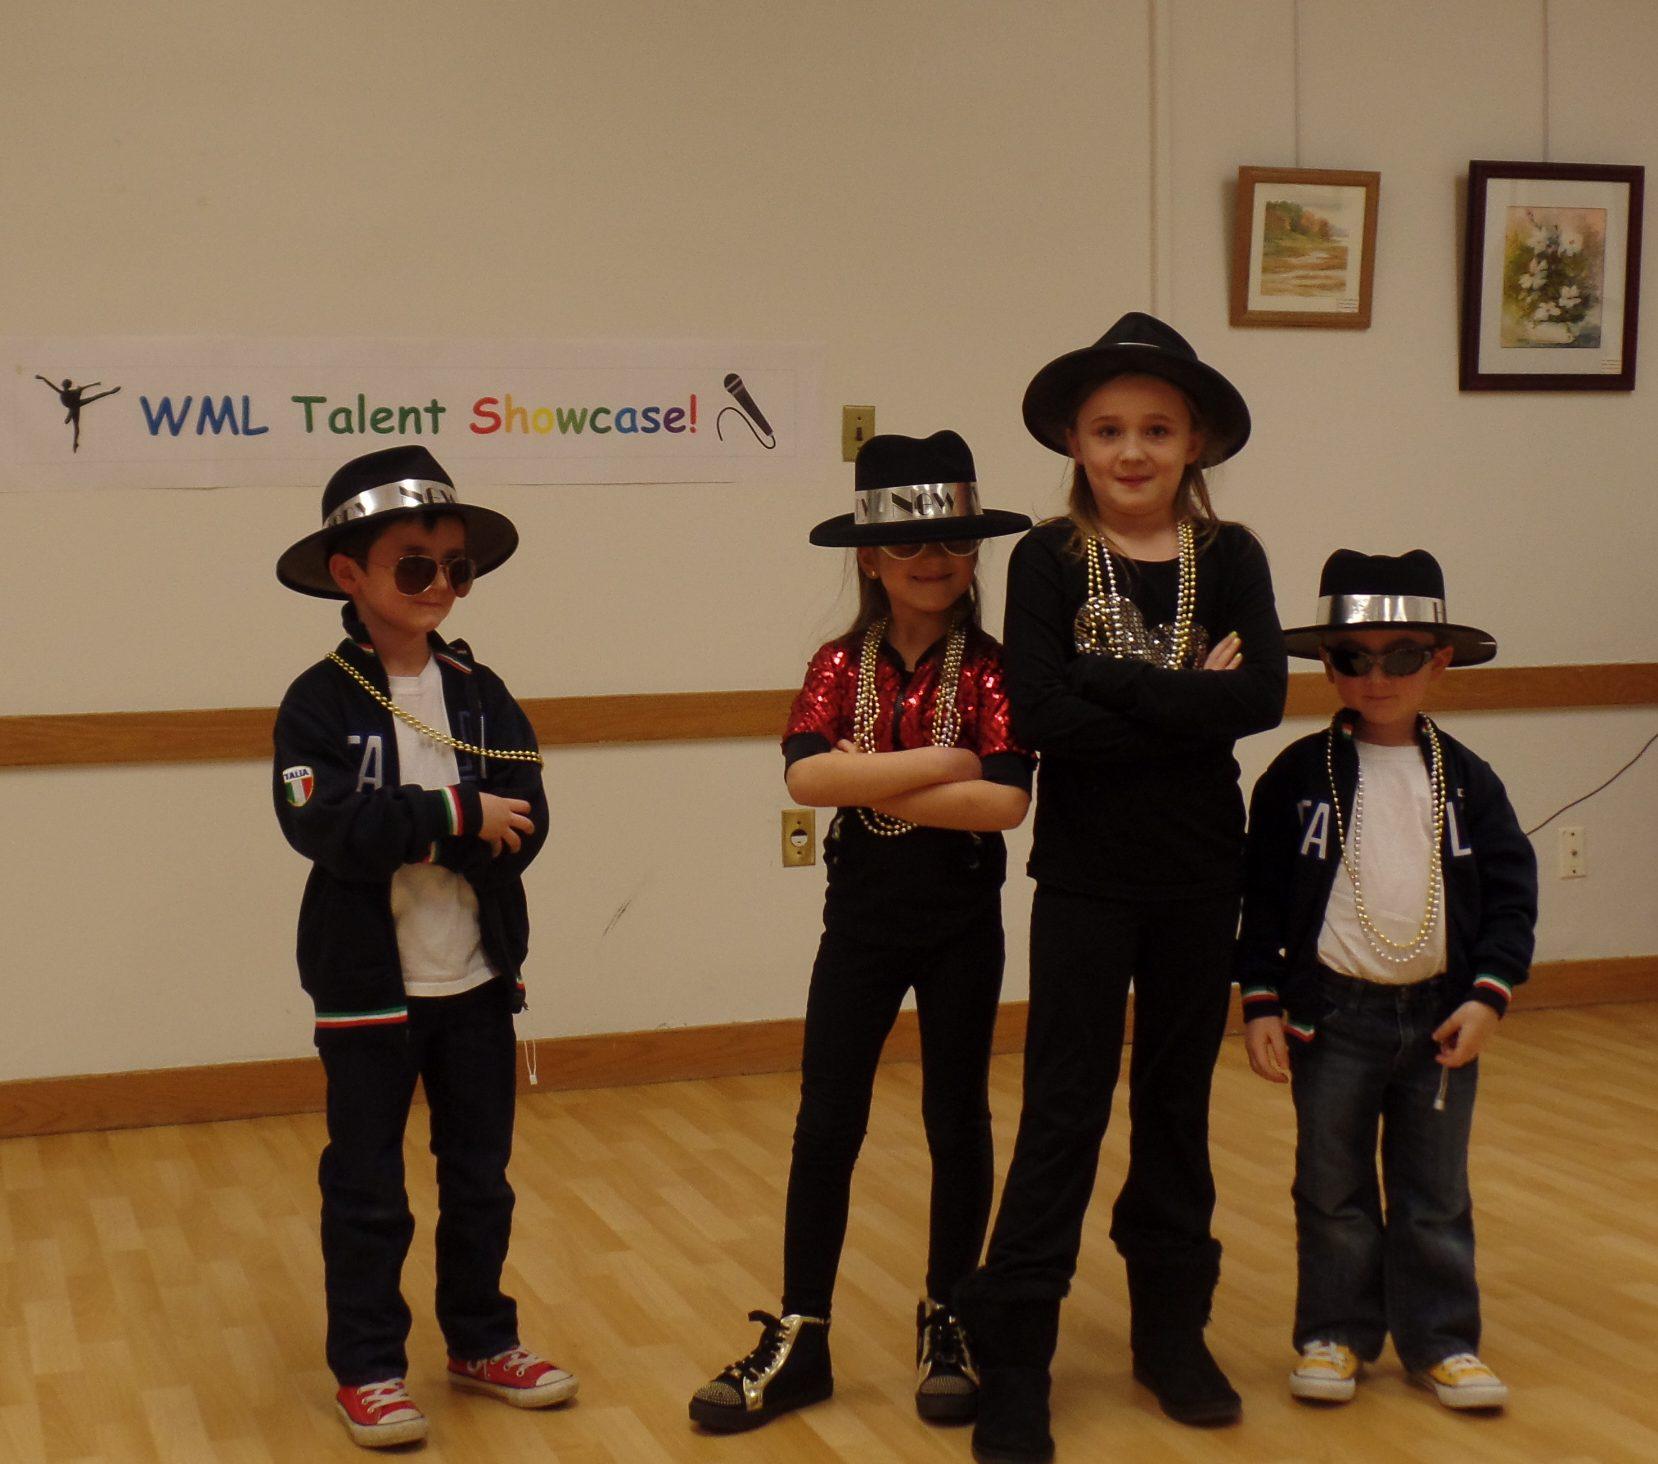 Kids Talent Show Performers